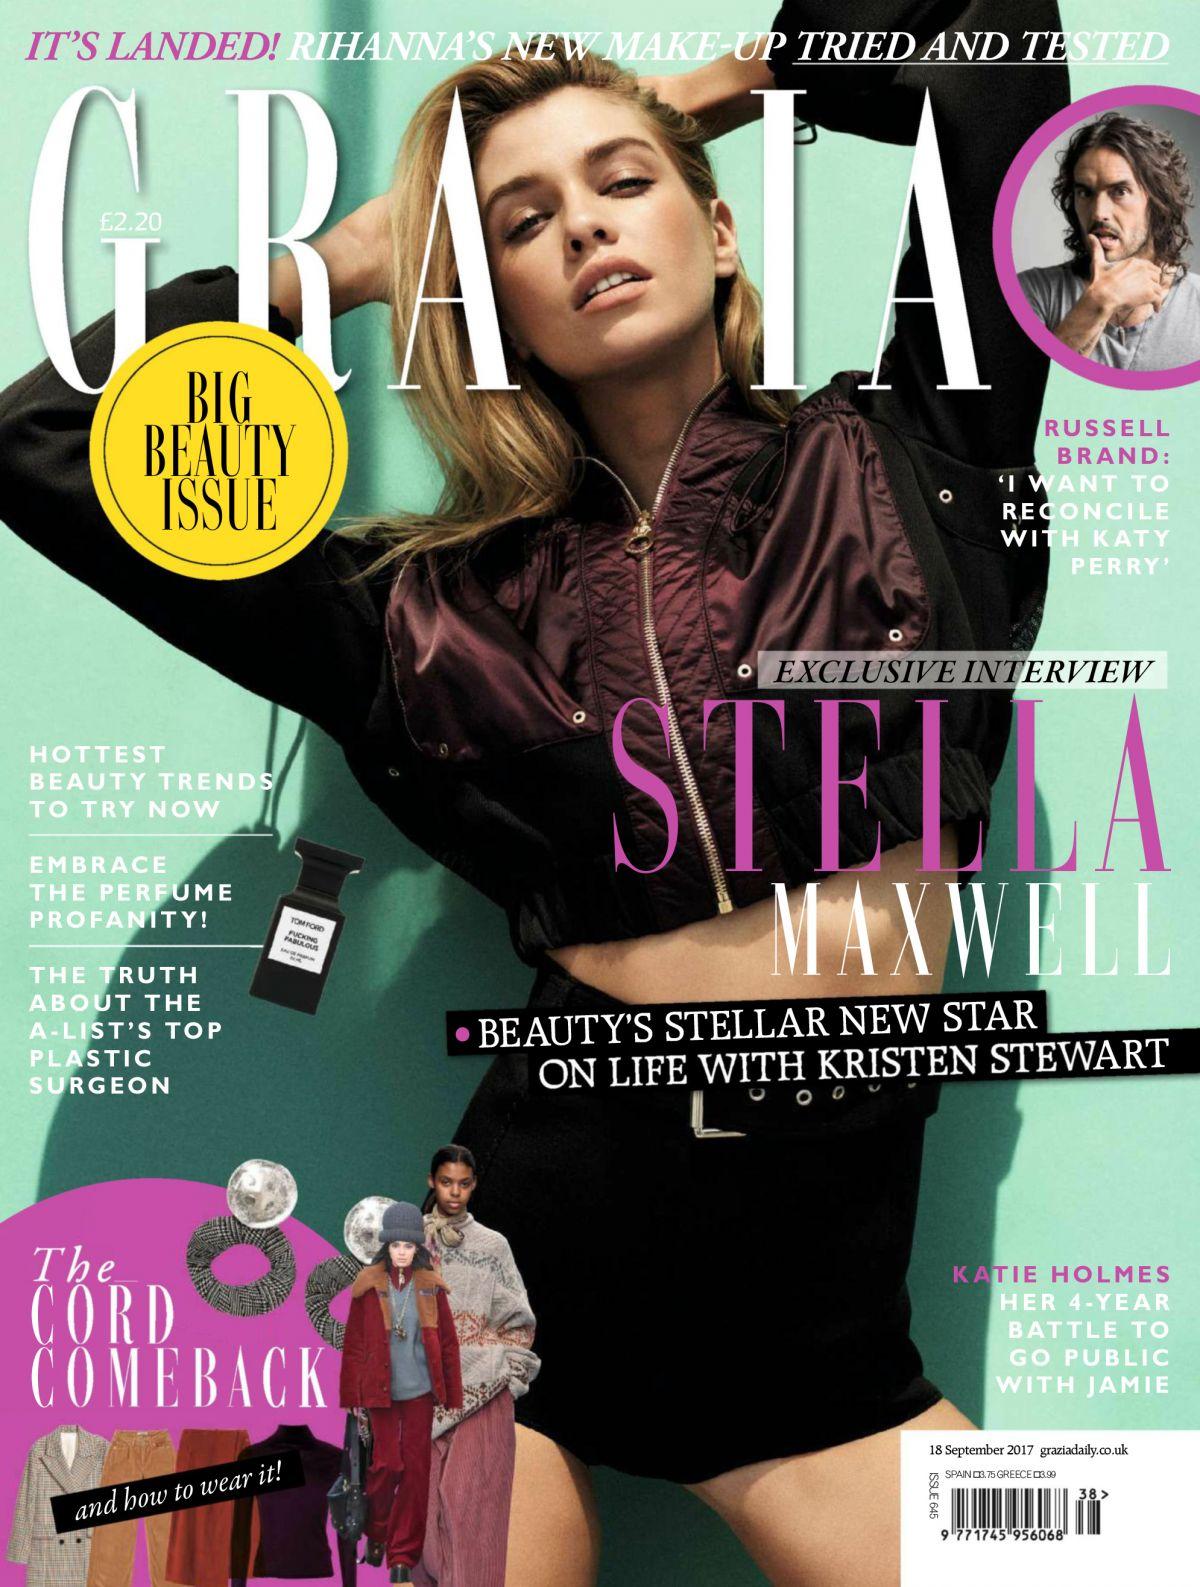 STELLA MAXWELL for Grazia Magazine, September 2017